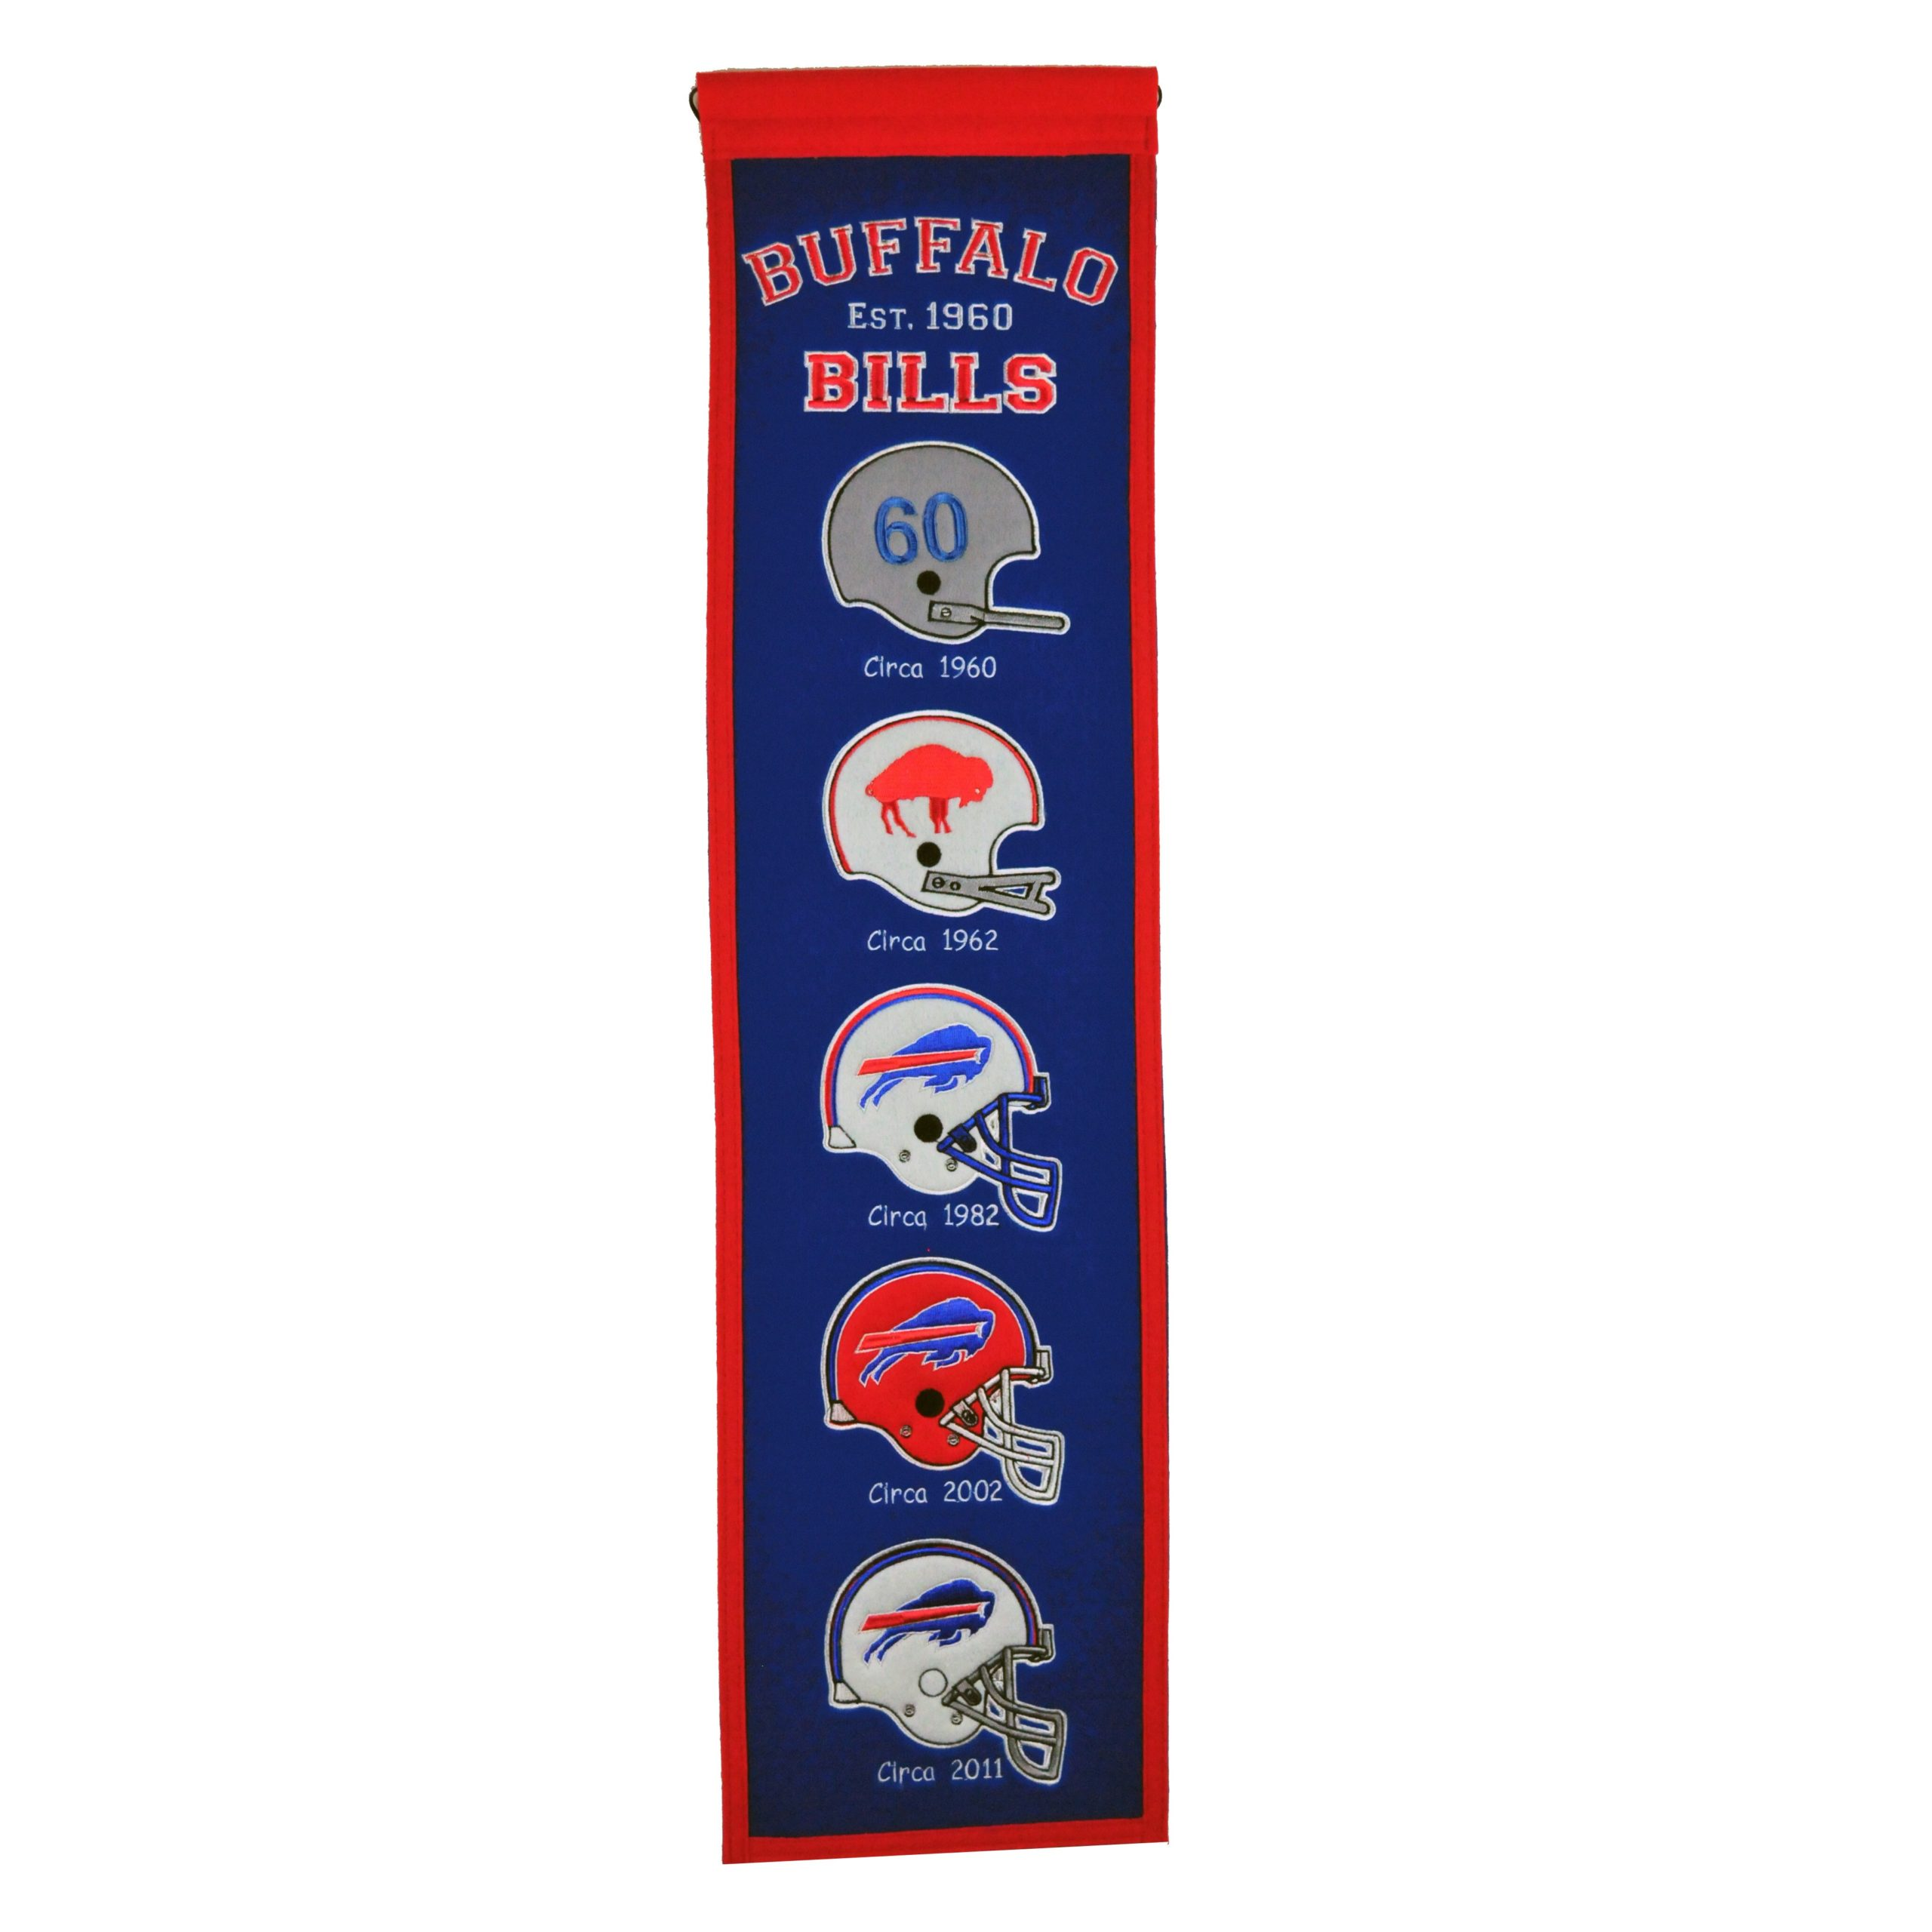 "Buffalo Bills 8"" x 32"" Premium Heritage Banner"